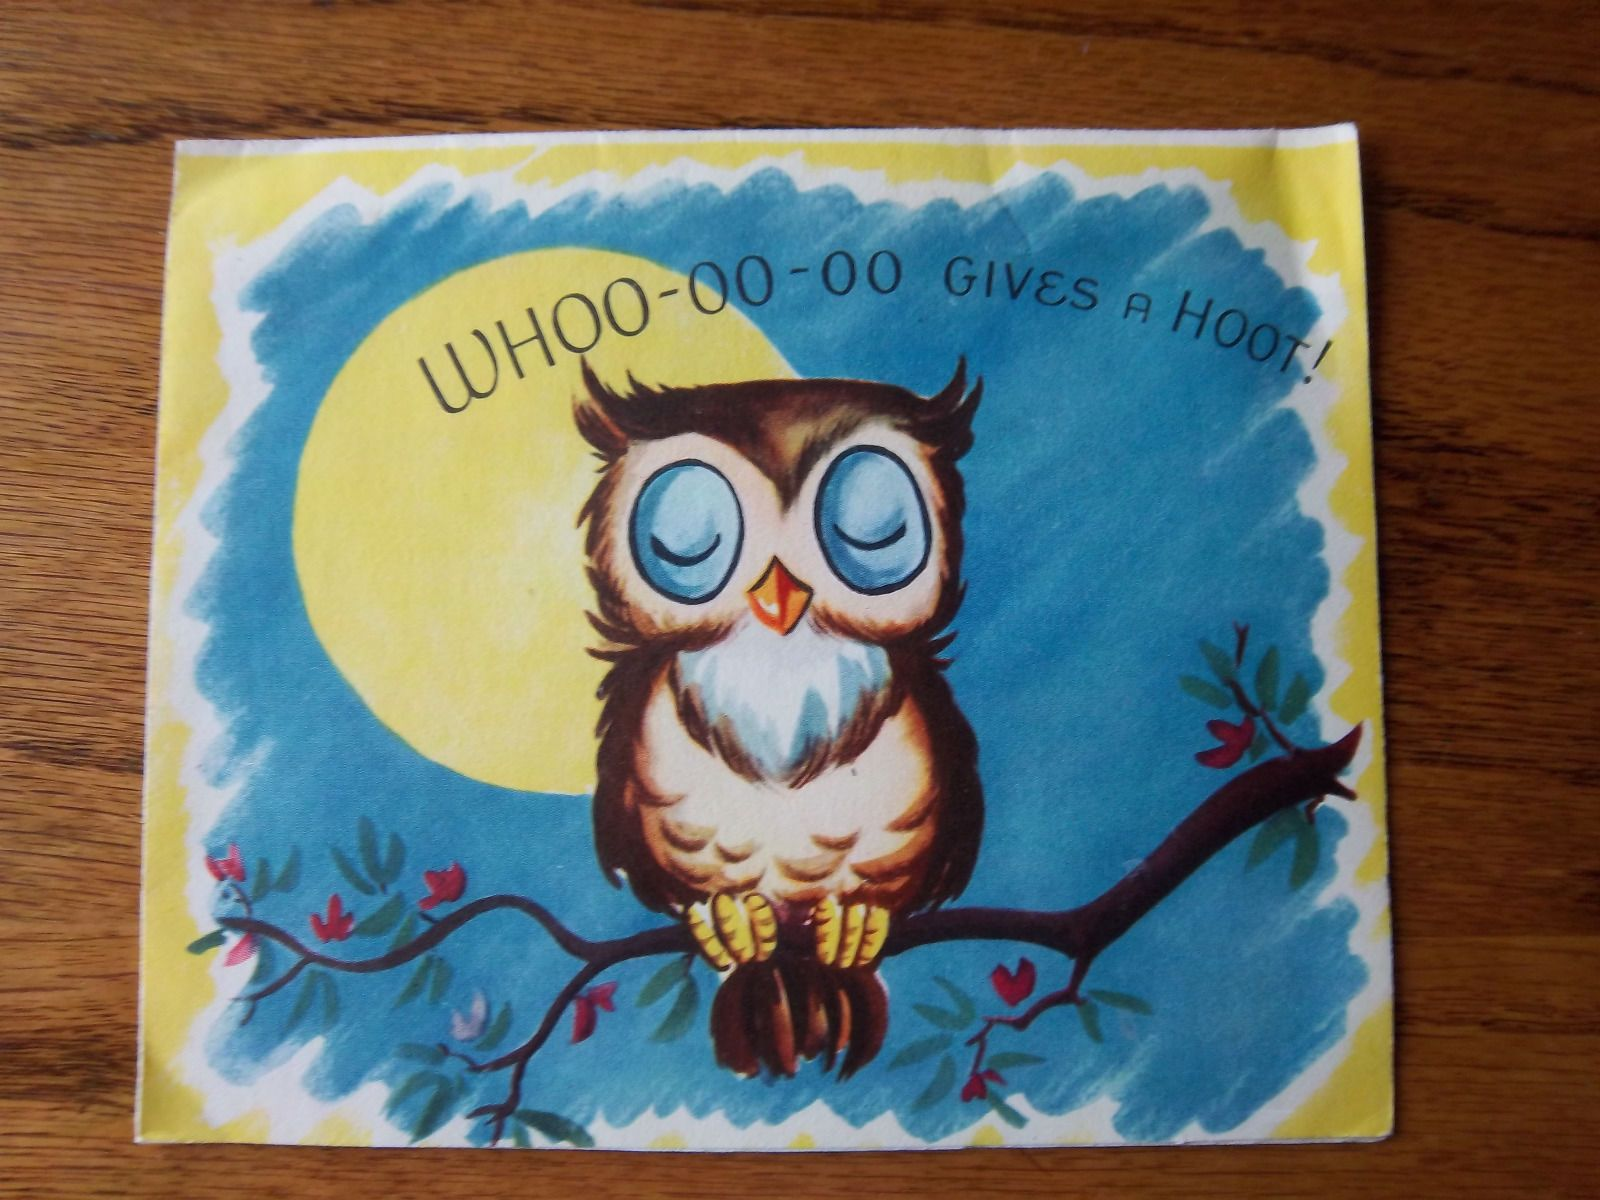 Pop Up 3d Paper Cardgreeting Card Birthday Card Love Cardvintage